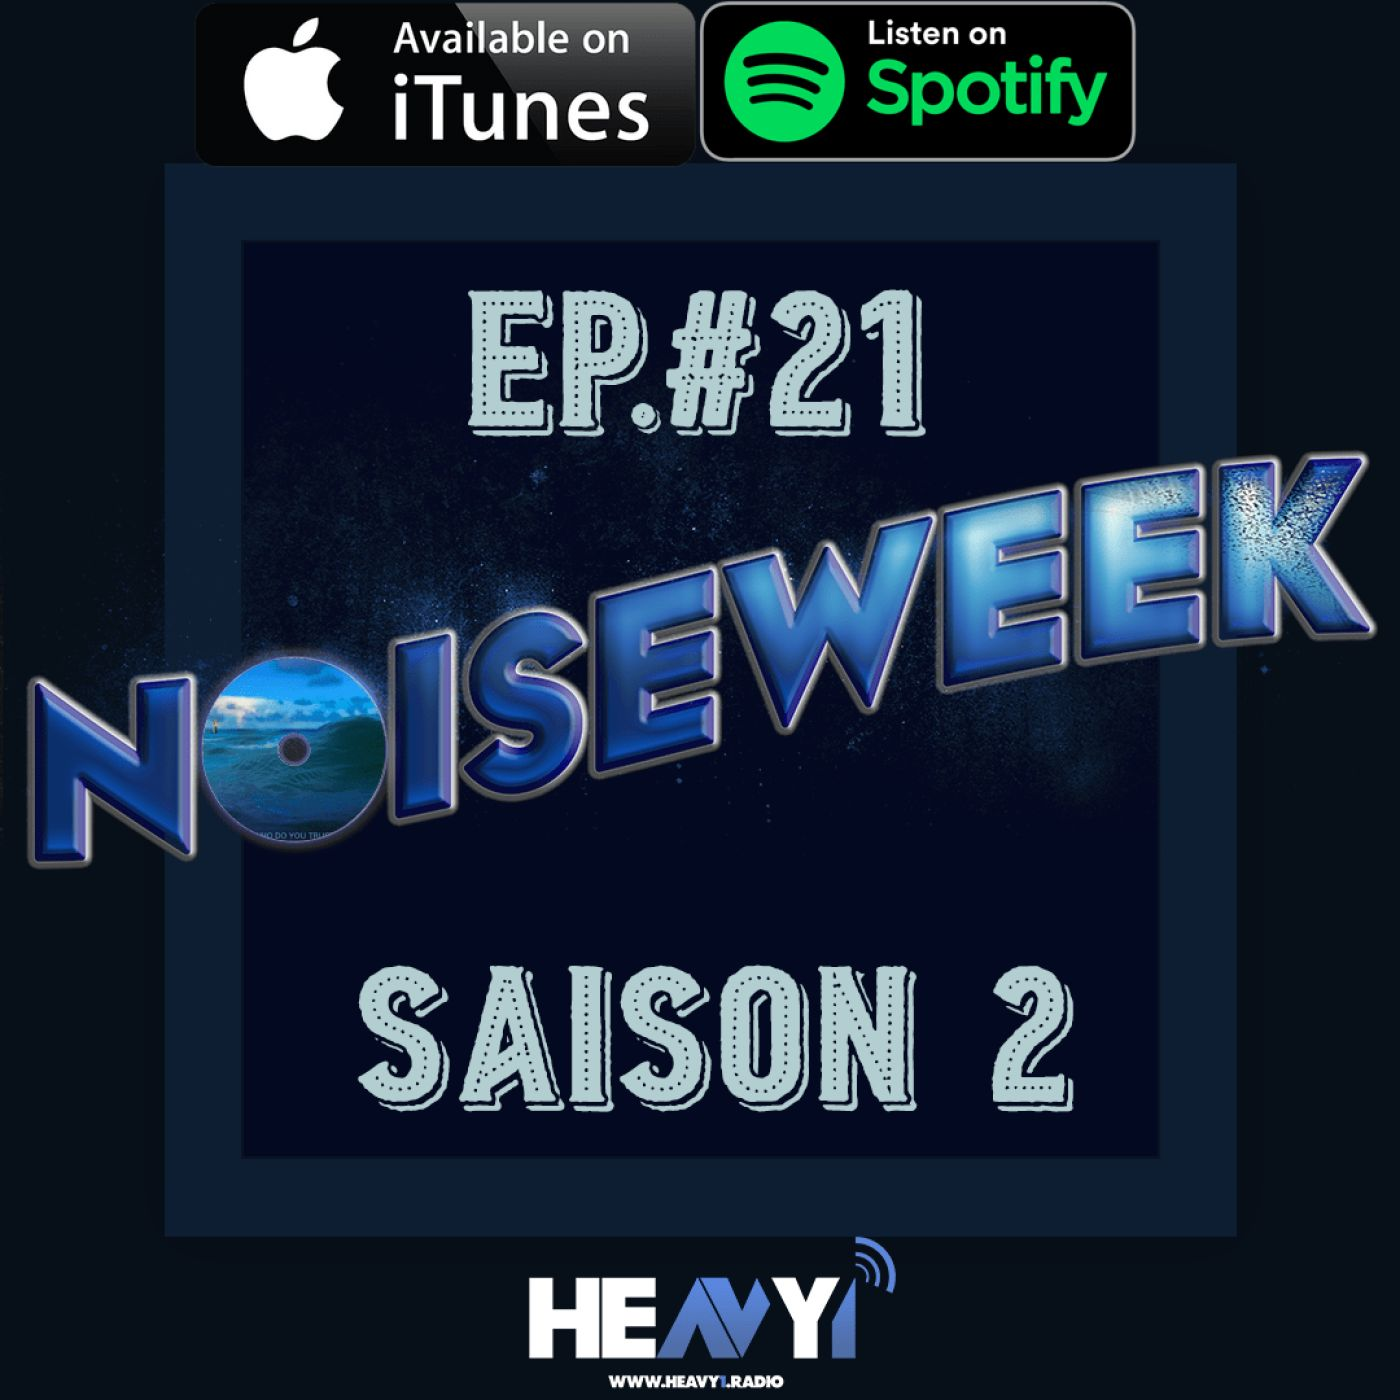 Noiseweek #21 Saison 2